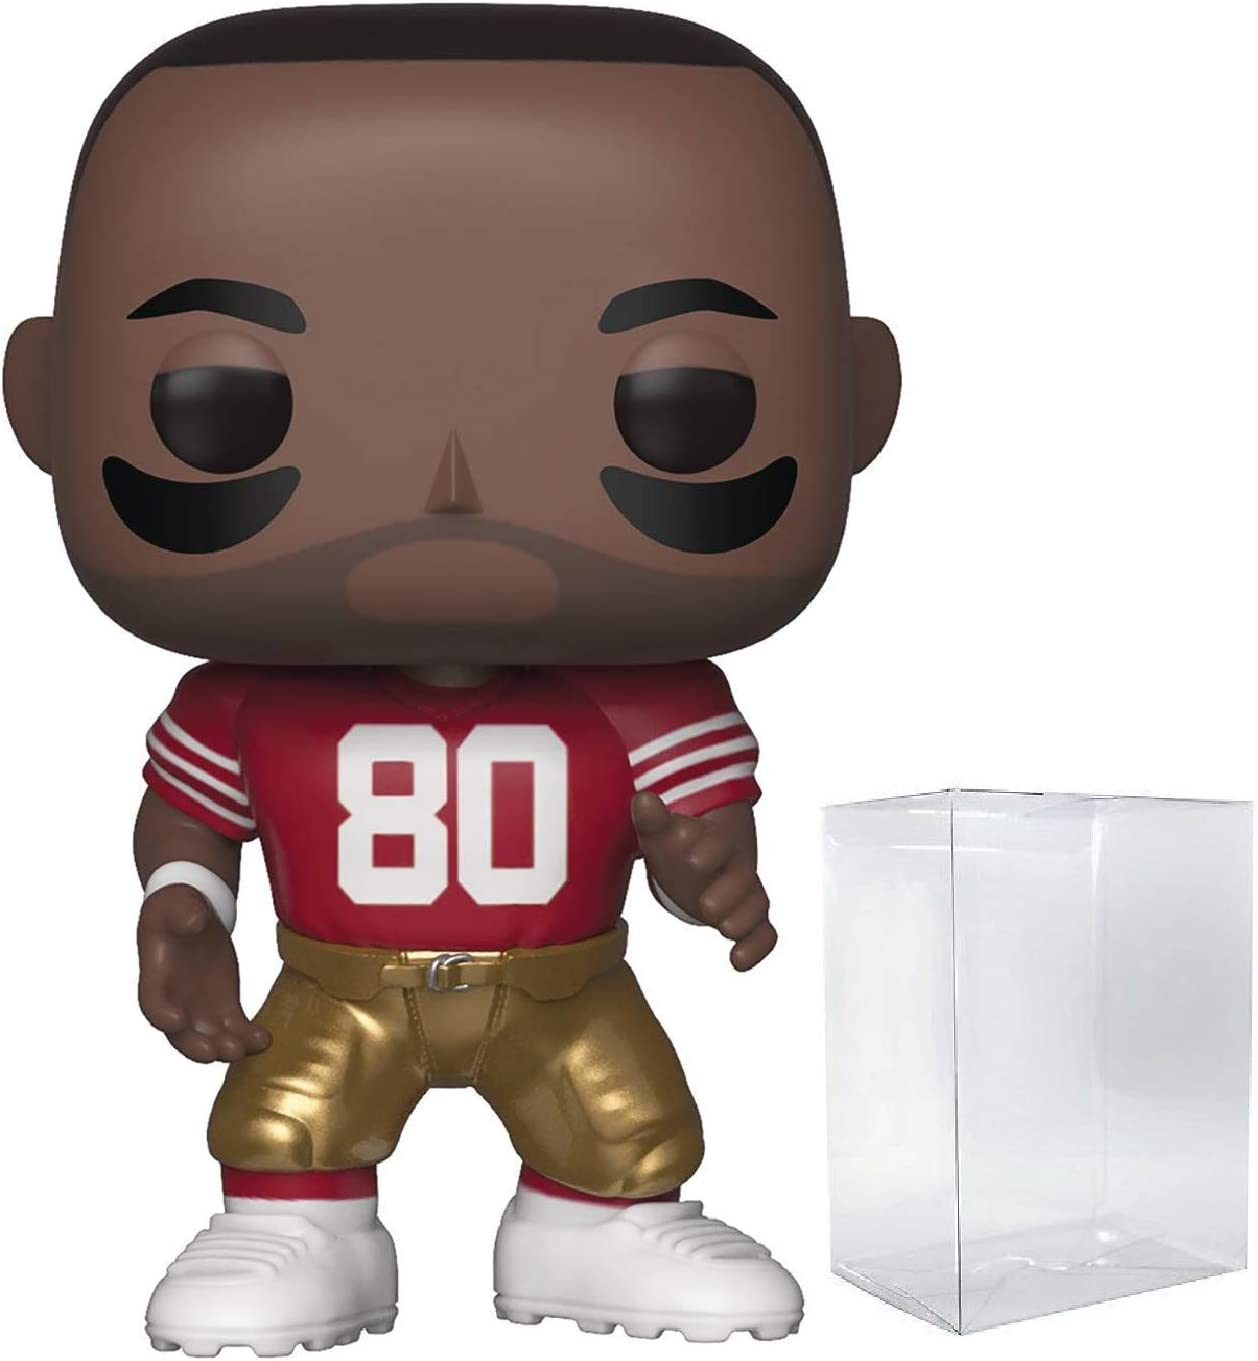 Pop NFL: San Francisco 49ers Pop Home Jersey Includes Compatible Pop Box Protector Case Vinyl Figure Nick Bosa